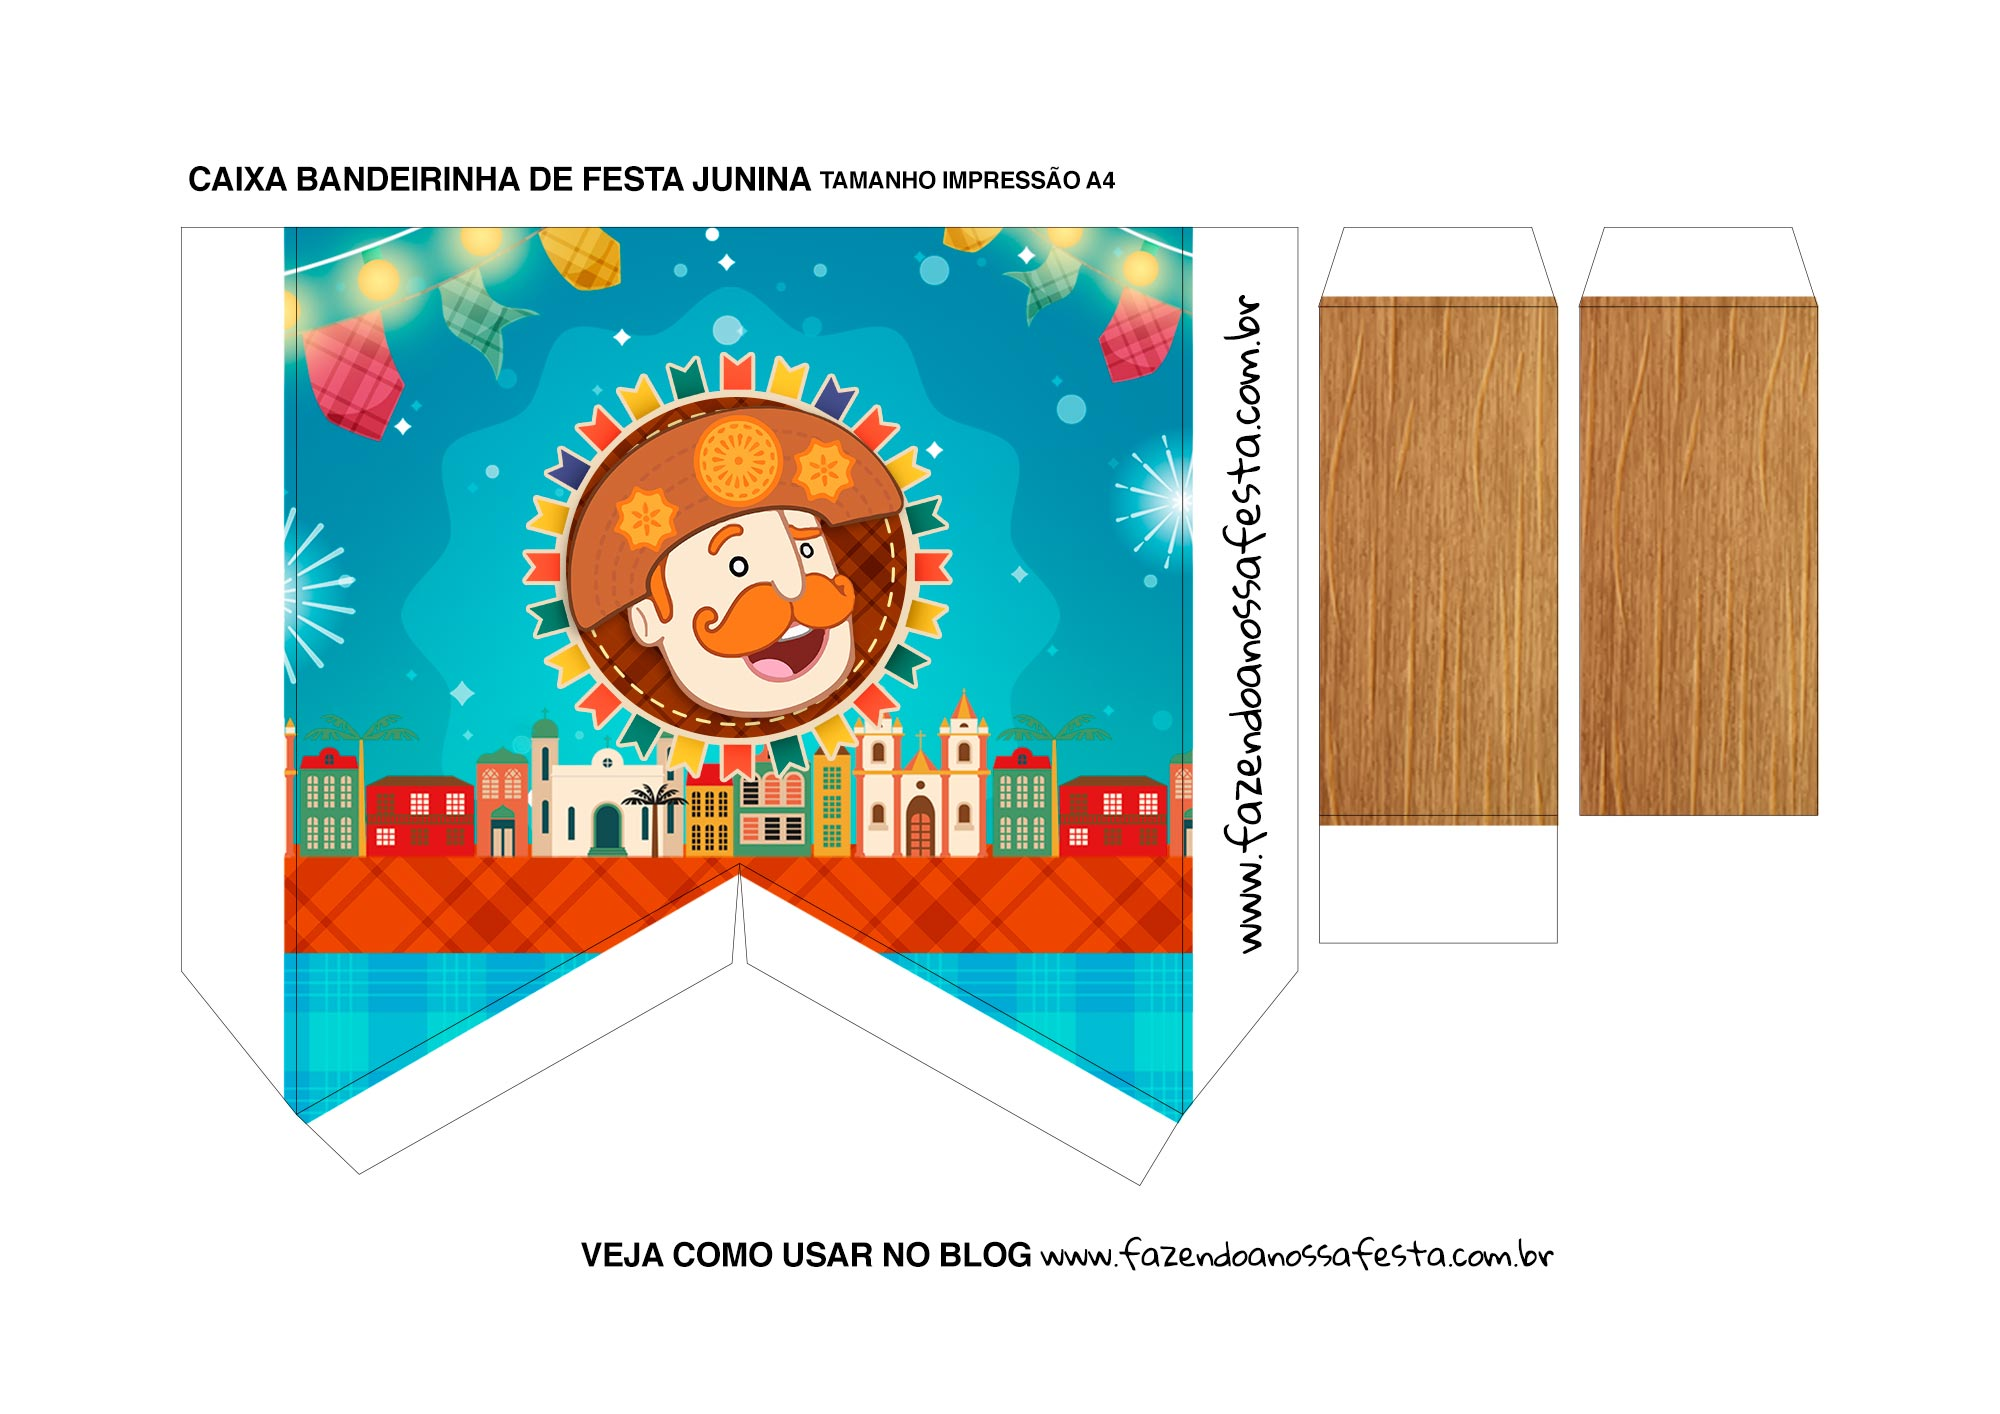 Caixa Bandeirinha Festa Junina Verso bandeirinha Kit Festa Junina do Bita